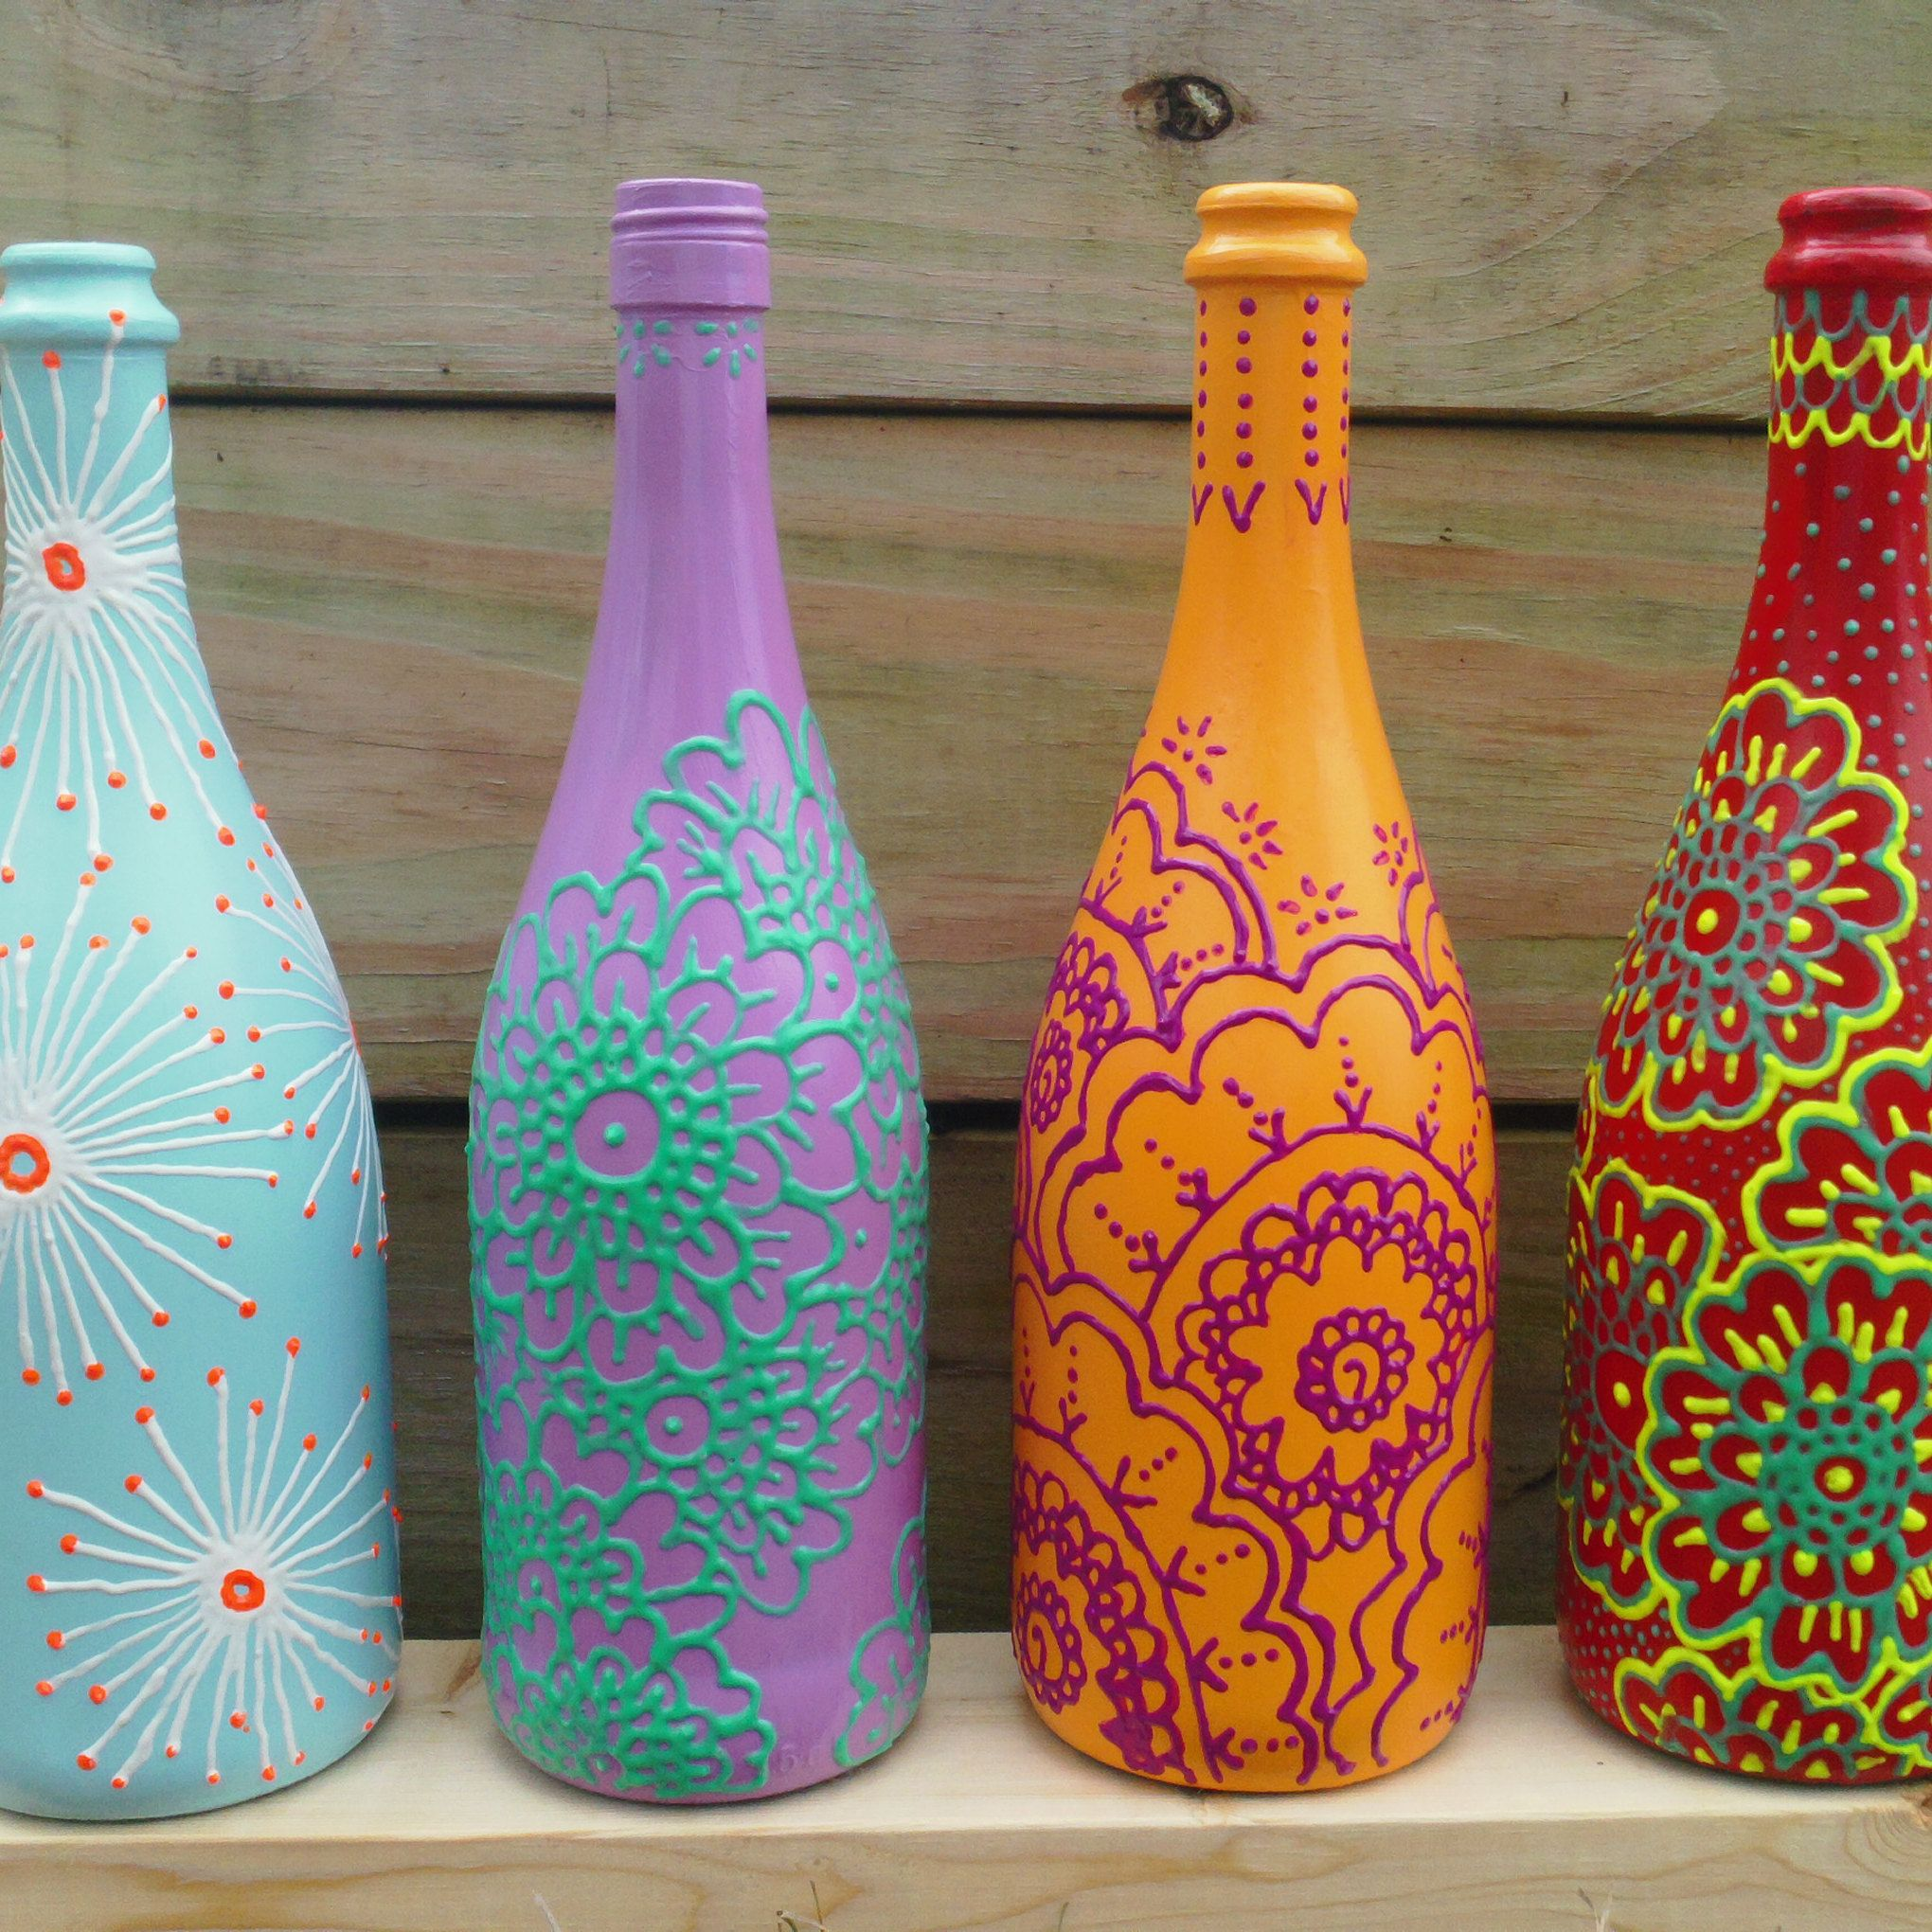 Hand Painted Wine Bottles #Artsy #Etsy #Socool